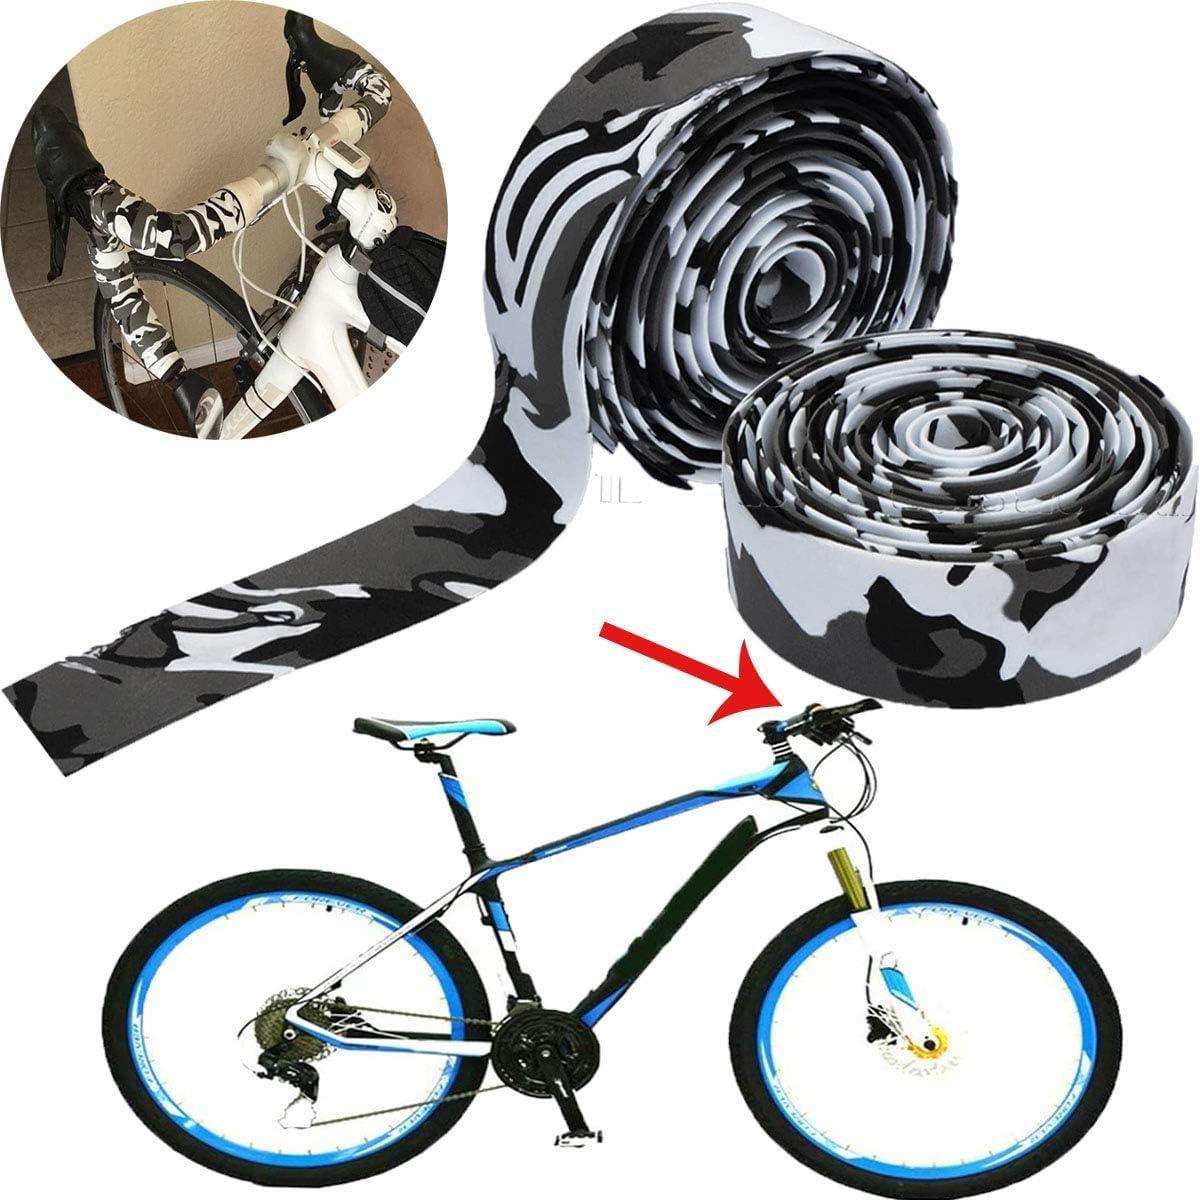 Bicycle Non-slip Handlebar Tape Bike Cycling Handle Bar Soft Grip Wrap v